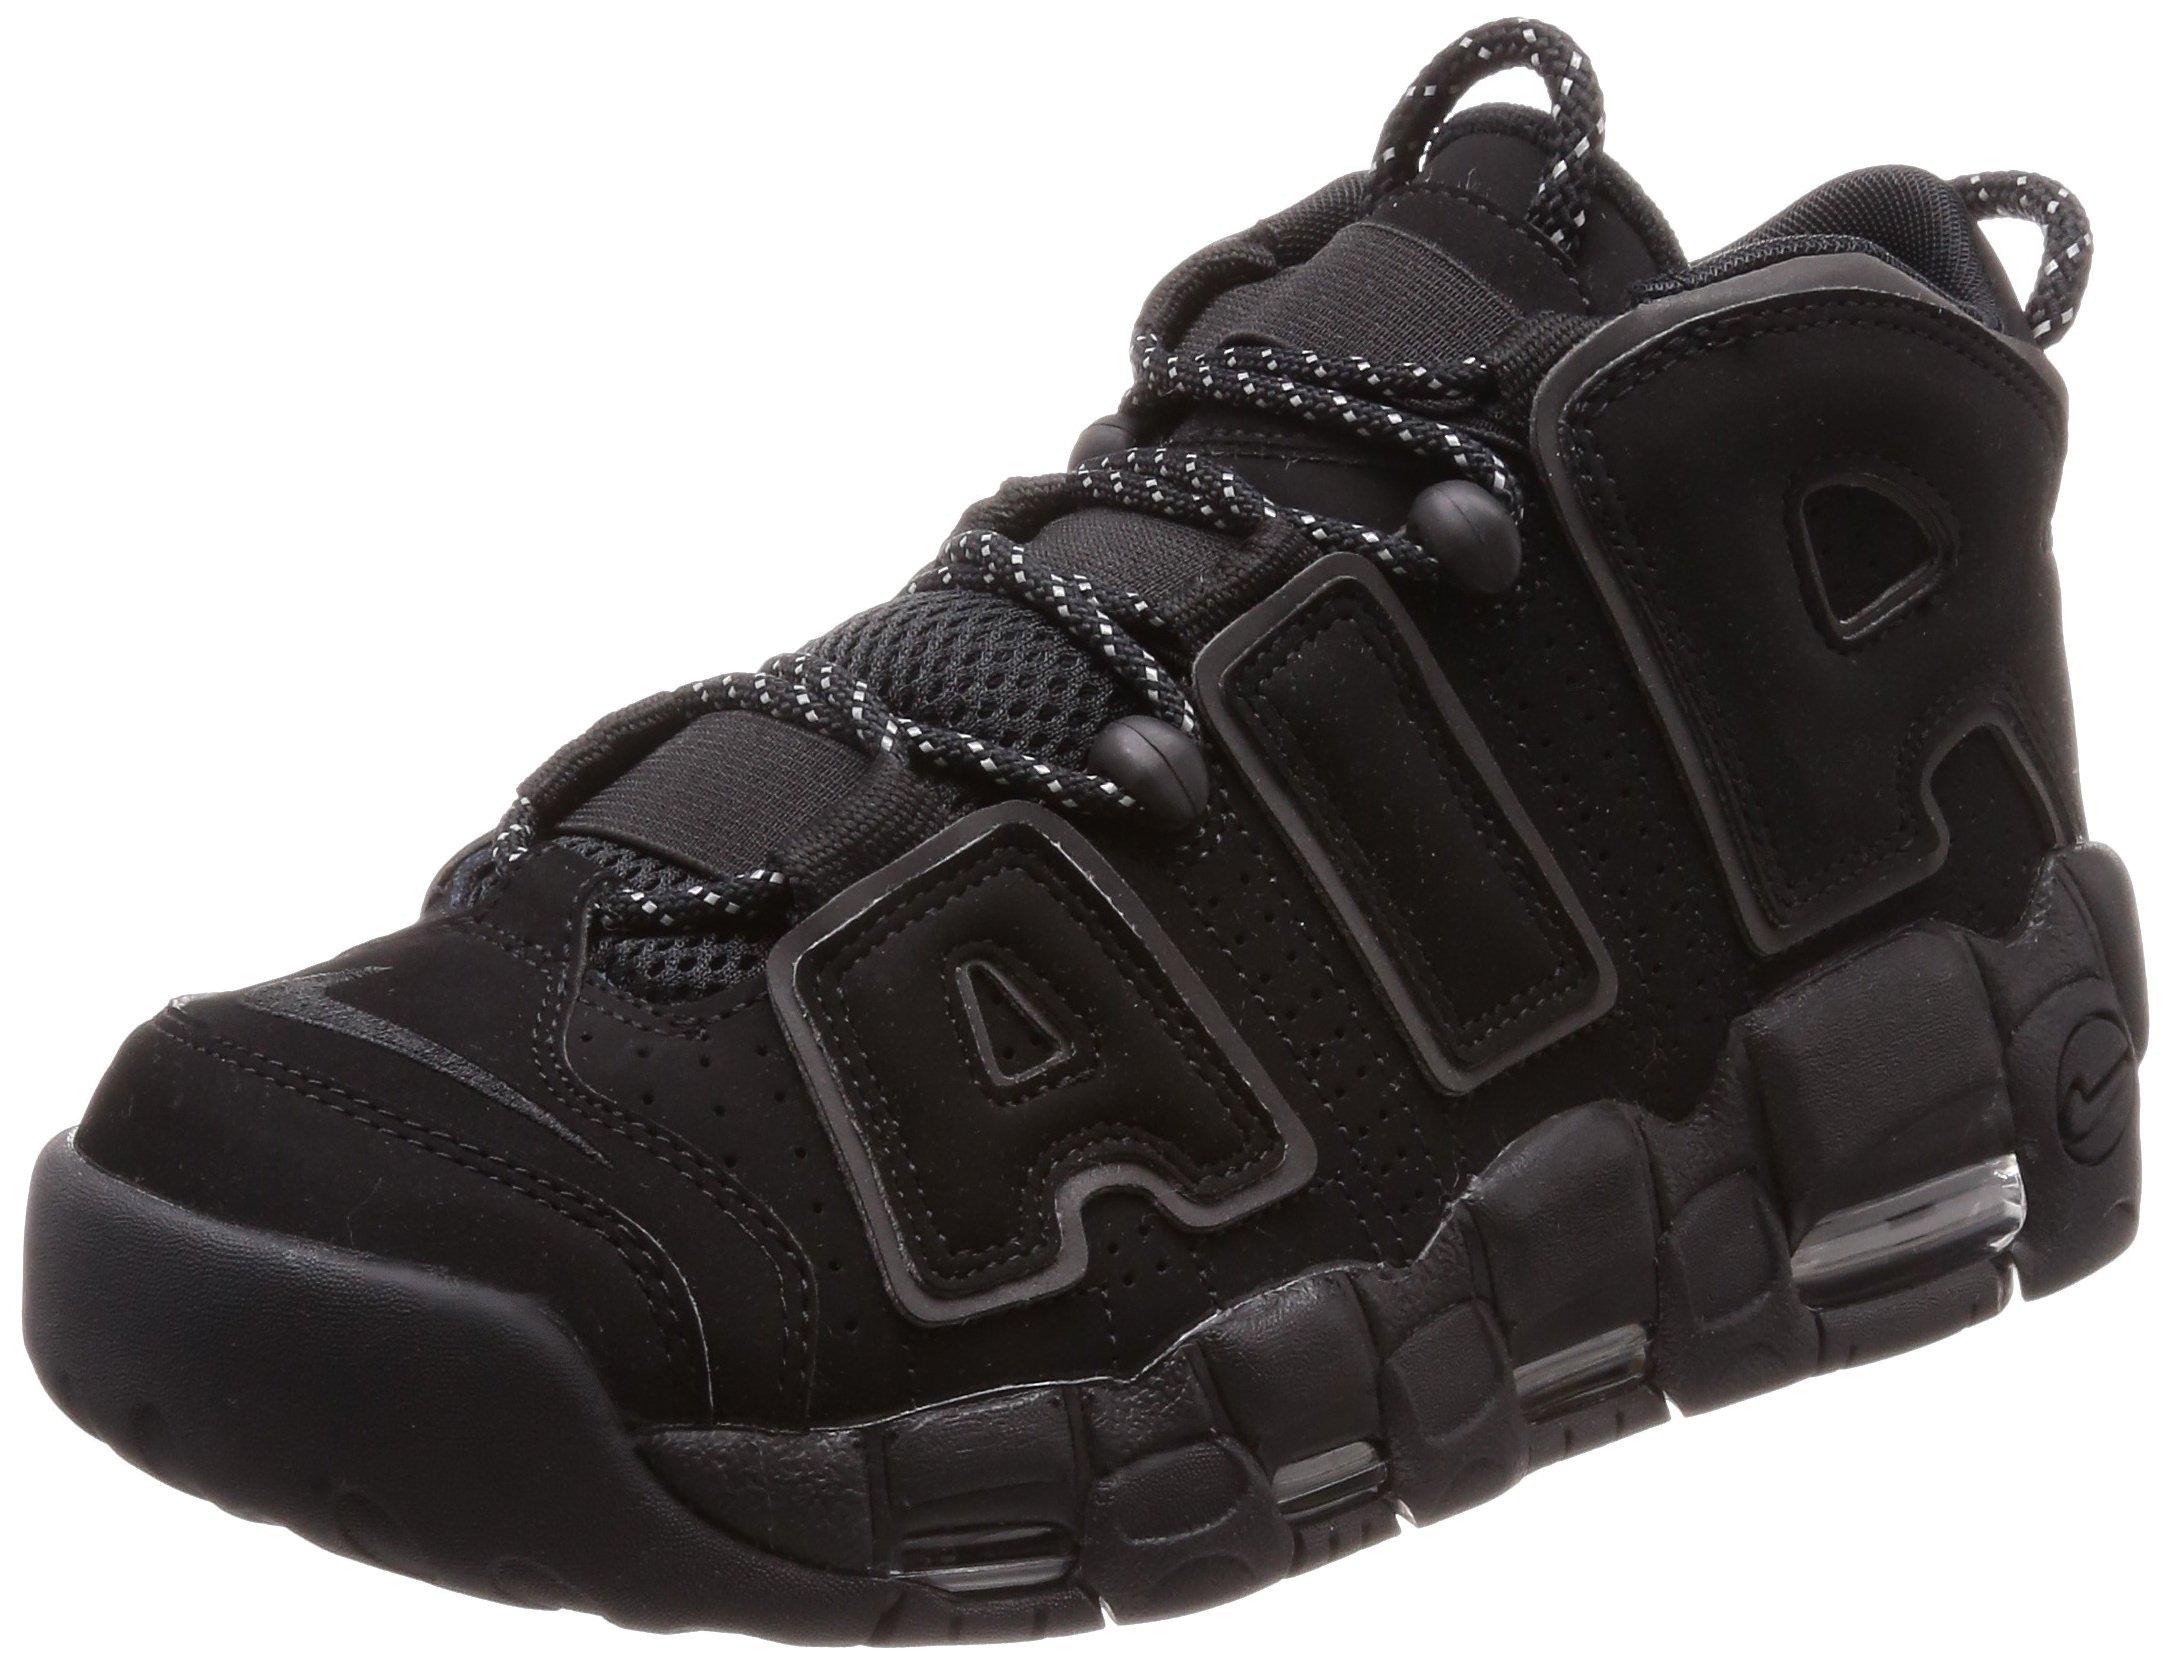 8f6557f163a4 Galleon - Nike Air More Uptempo Mens 414962-004 Size 9 Black Black-Black